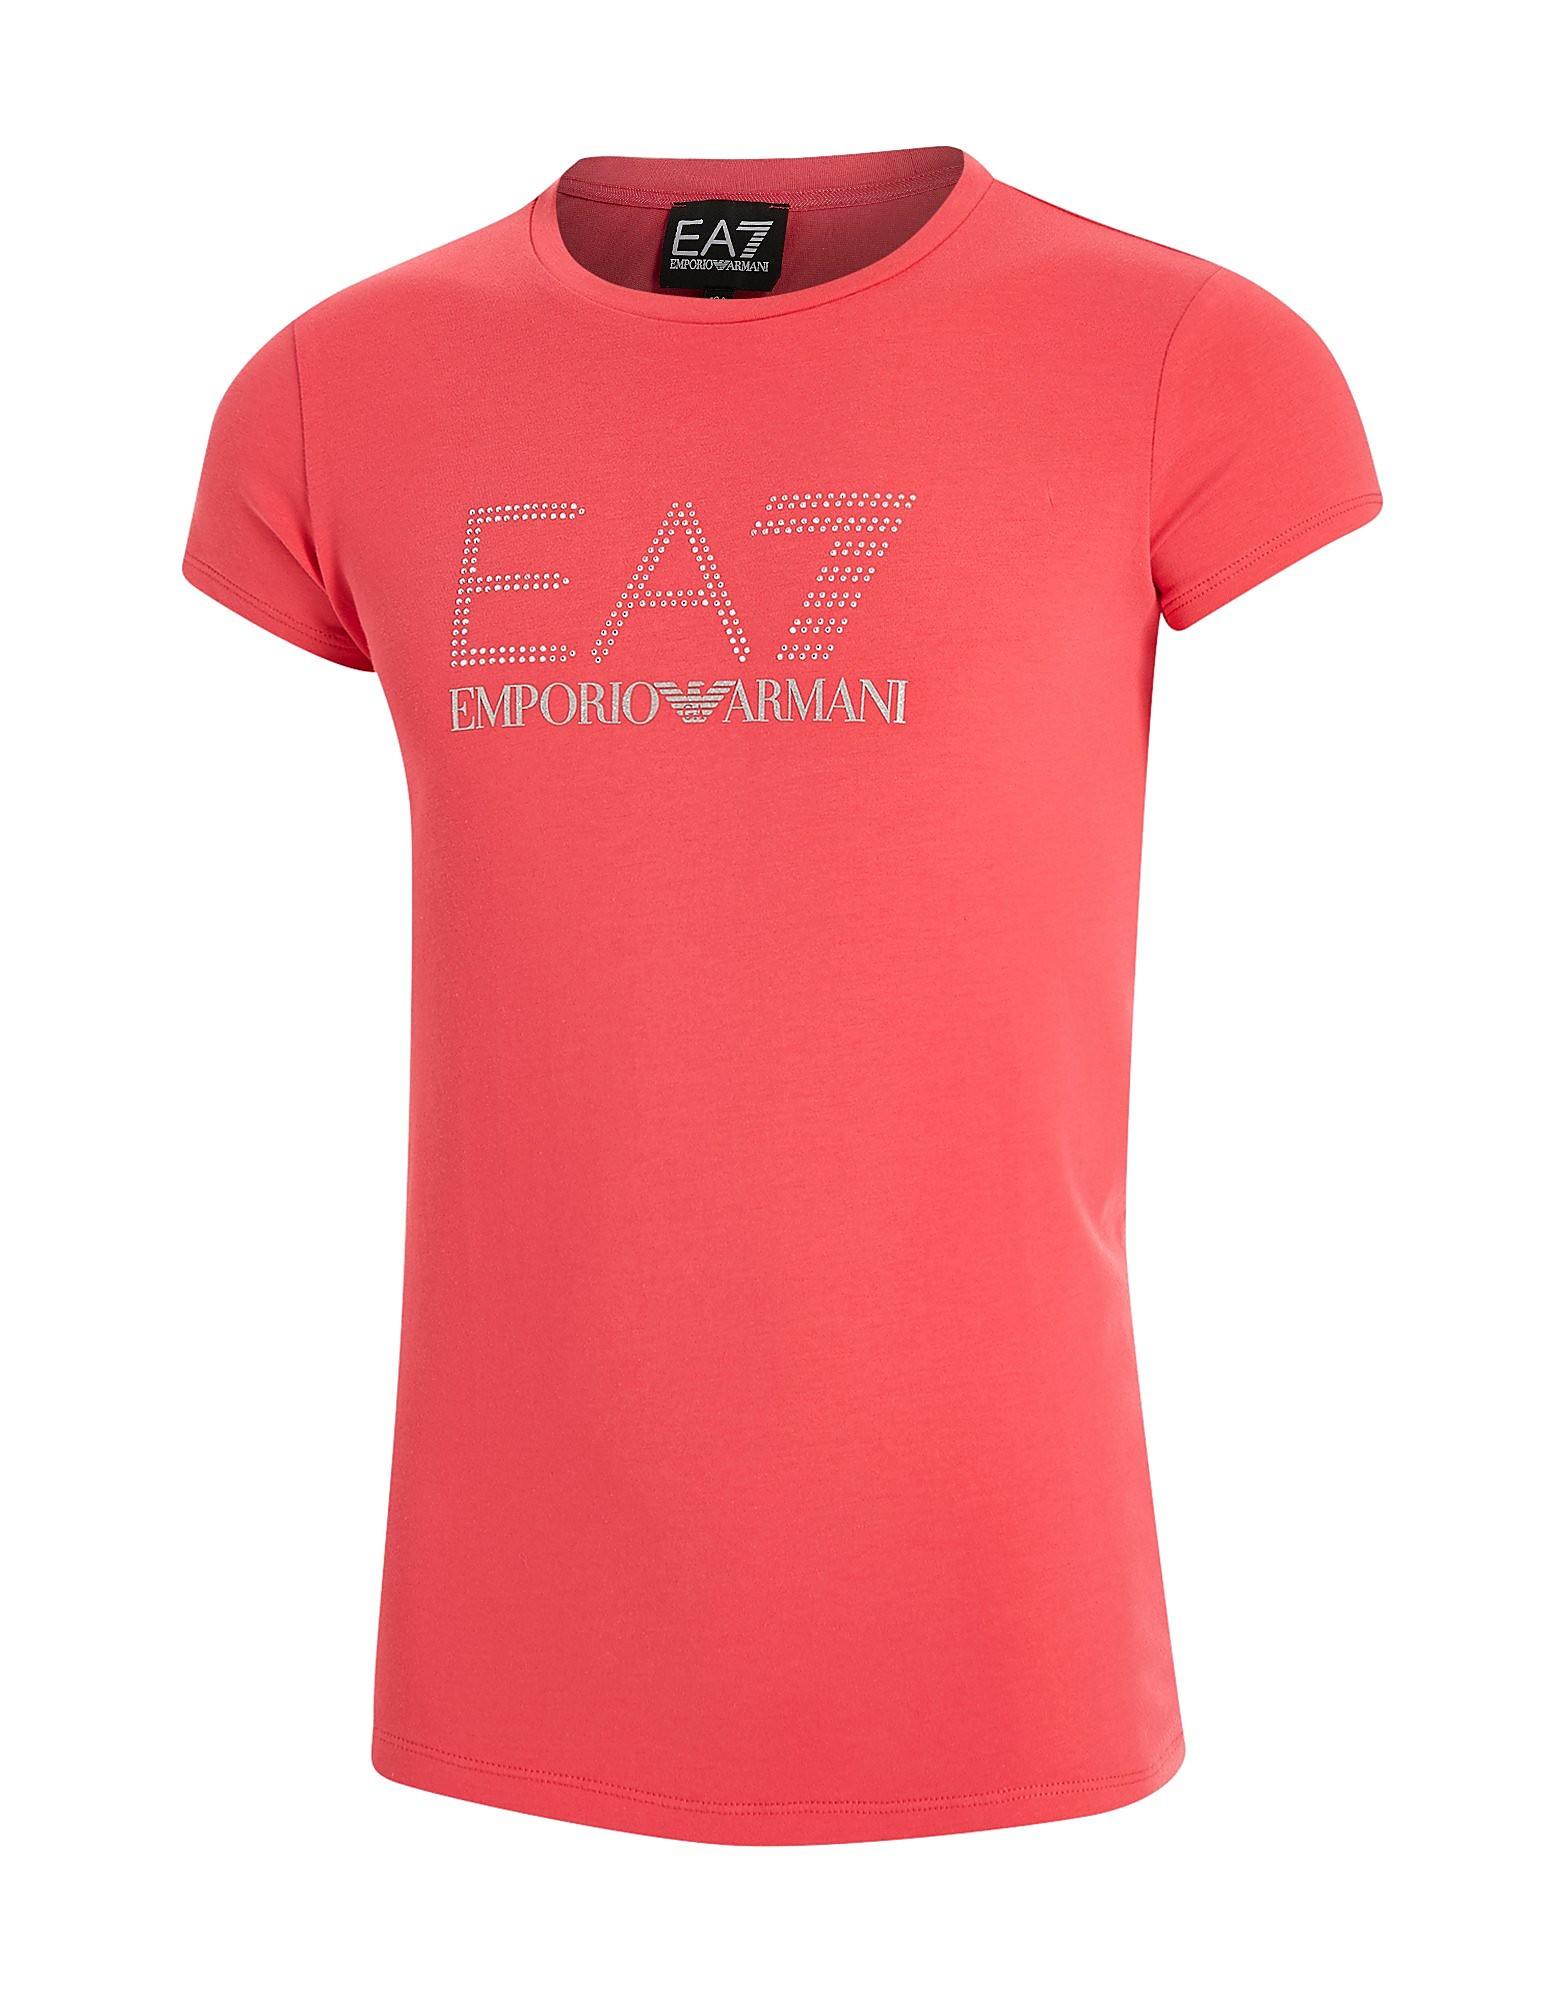 Emporio Armani EA7 Girls' Bling T-Shirt Junior